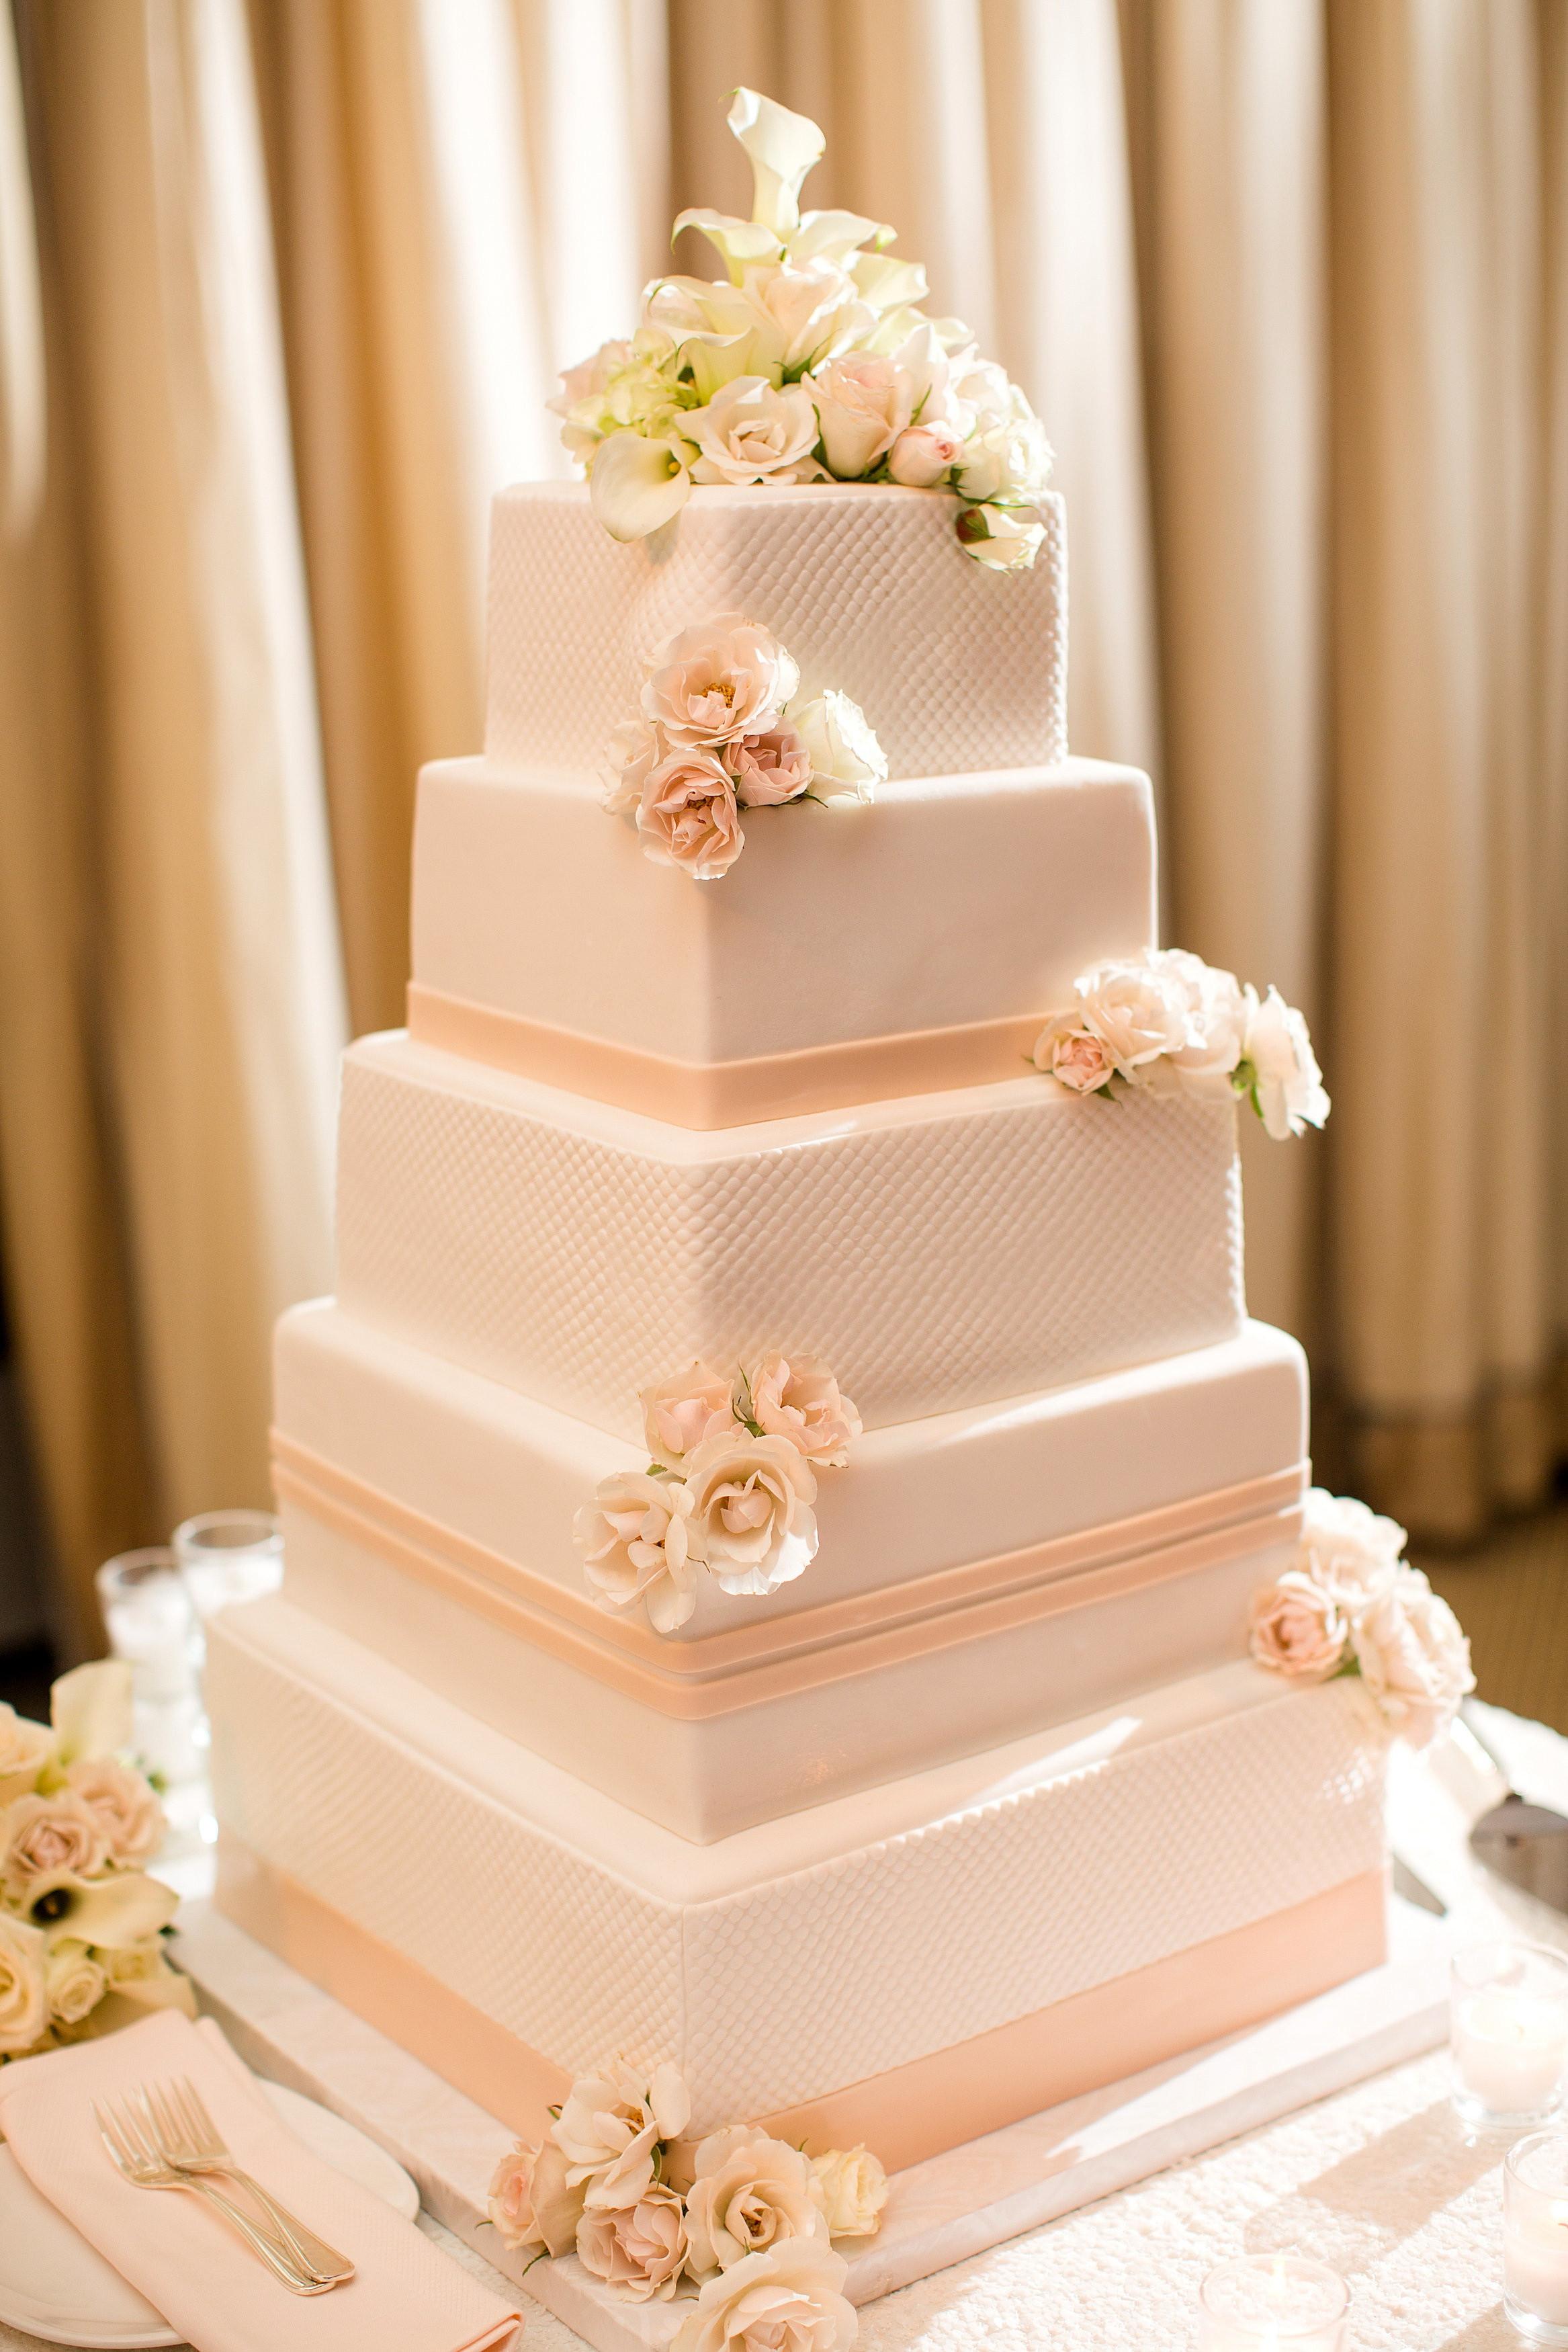 Vanilla Wedding Cakes  Vanilla Bake Shop Wedding Cakes